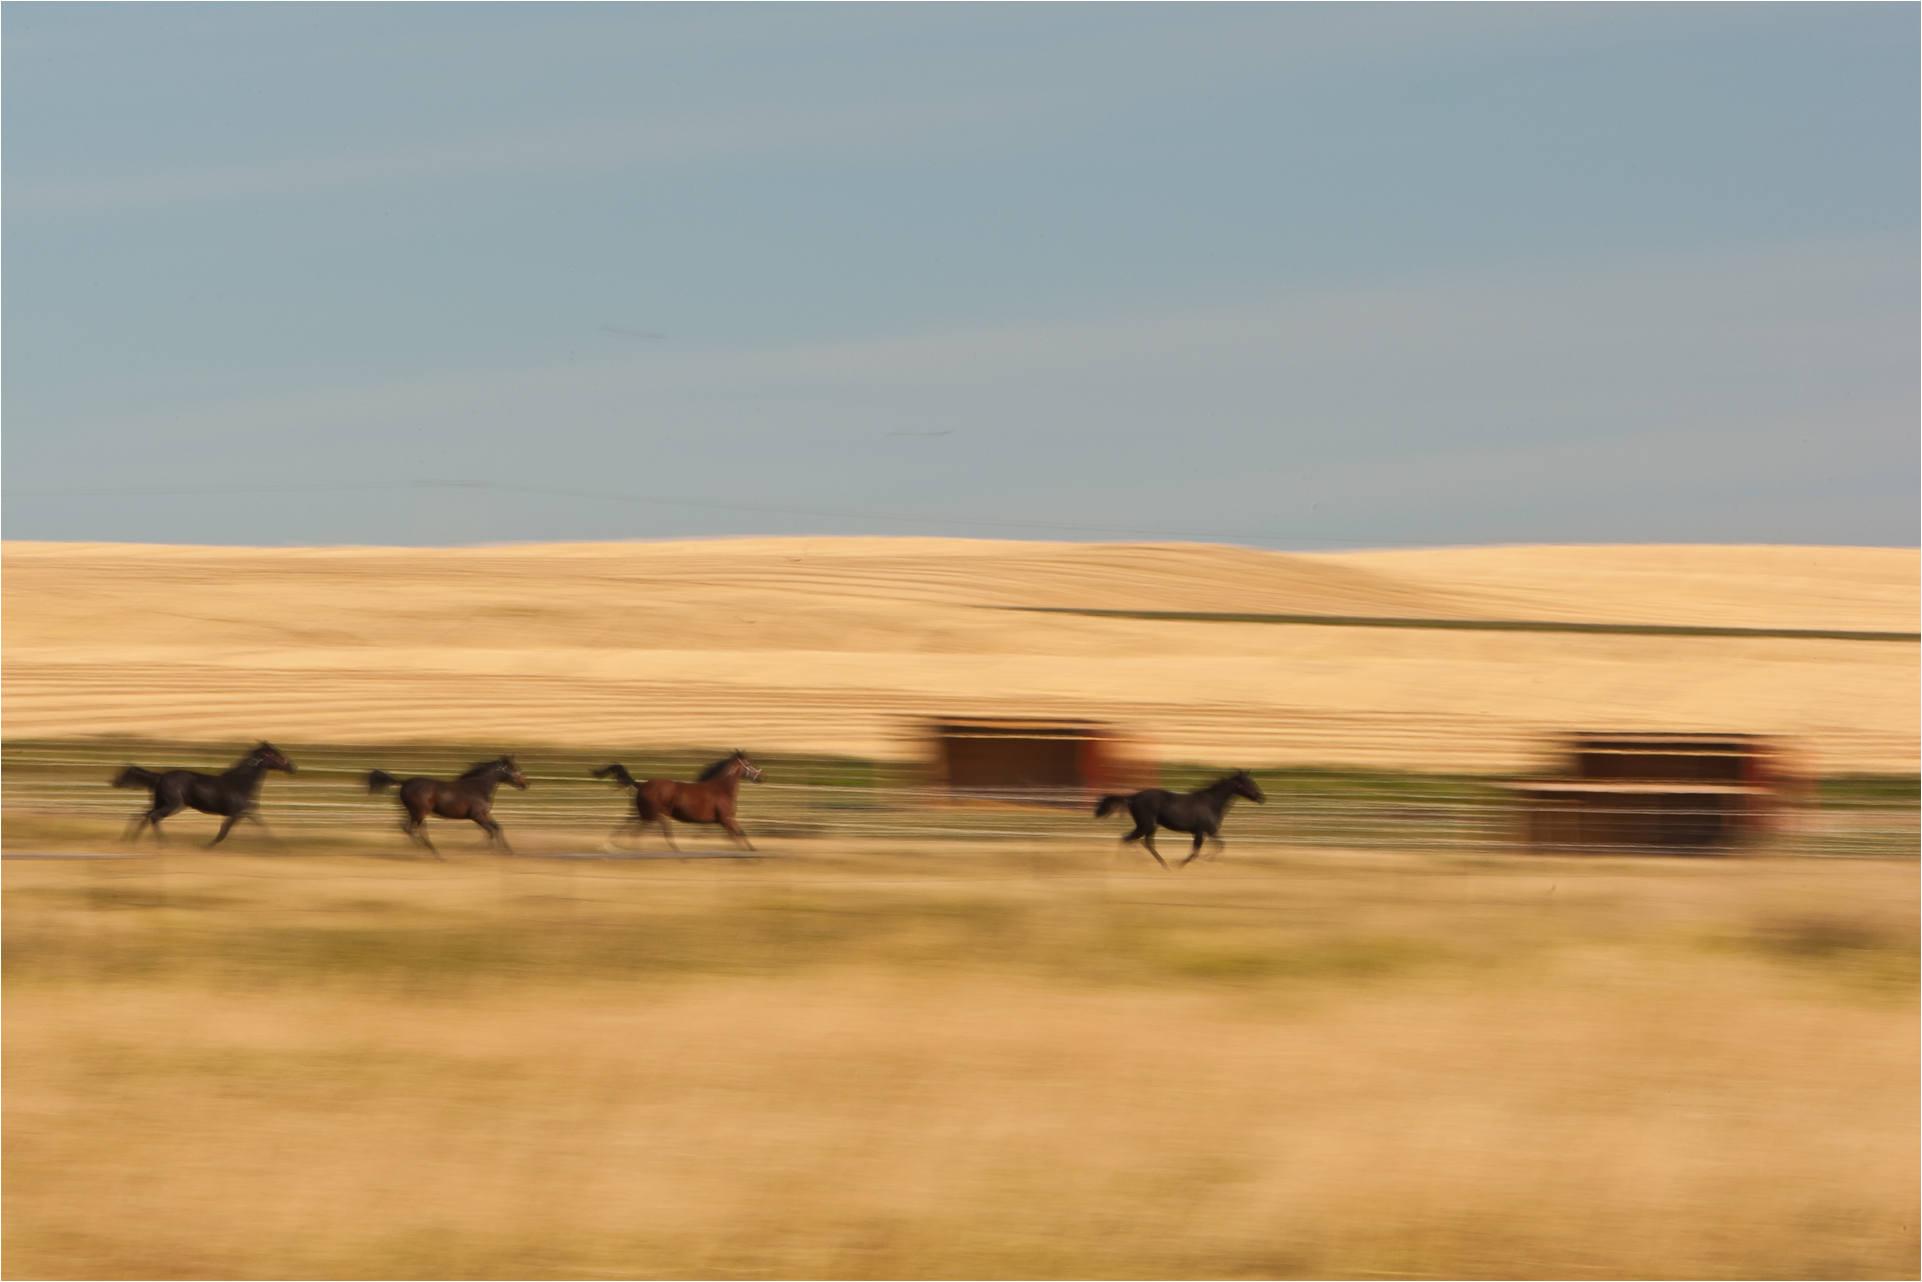 Train Christopher Martin Photography